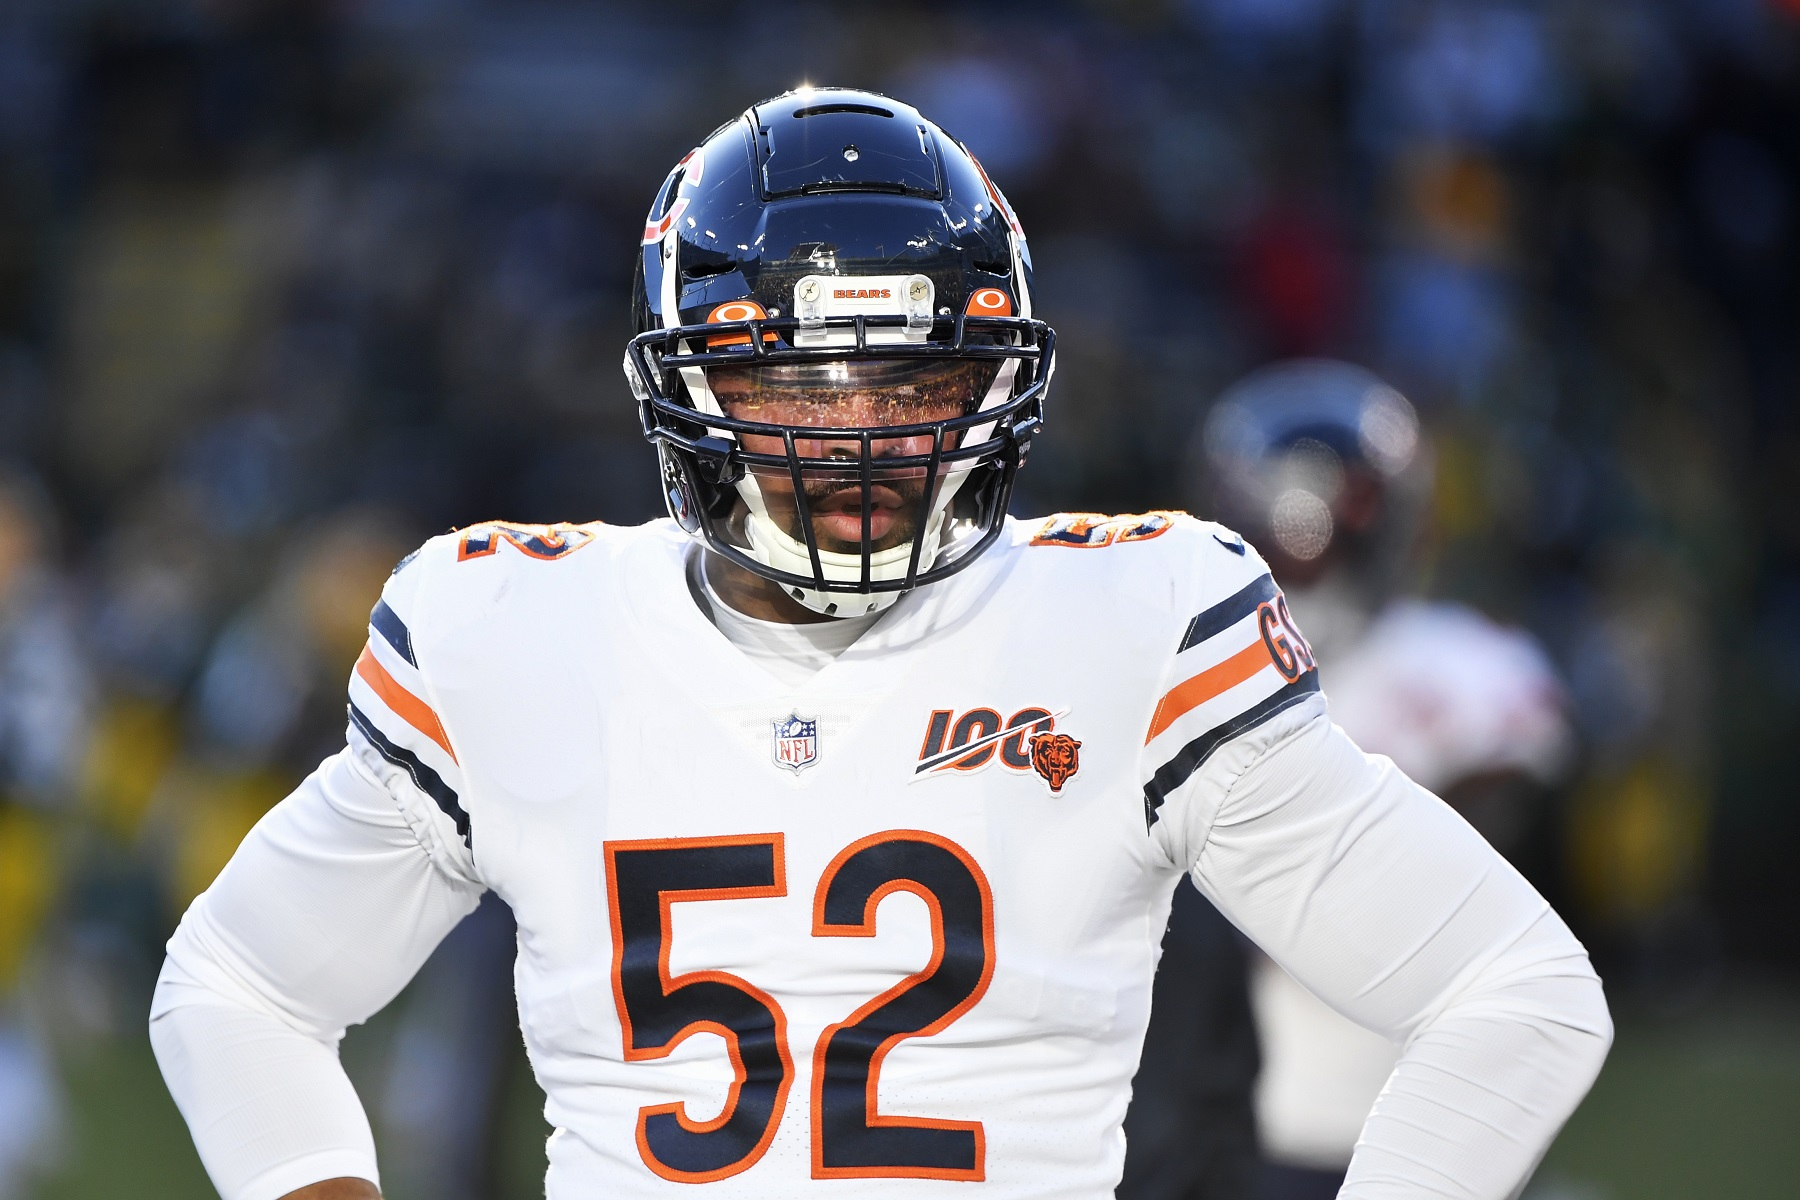 Khalil Mack, Chicago Bears